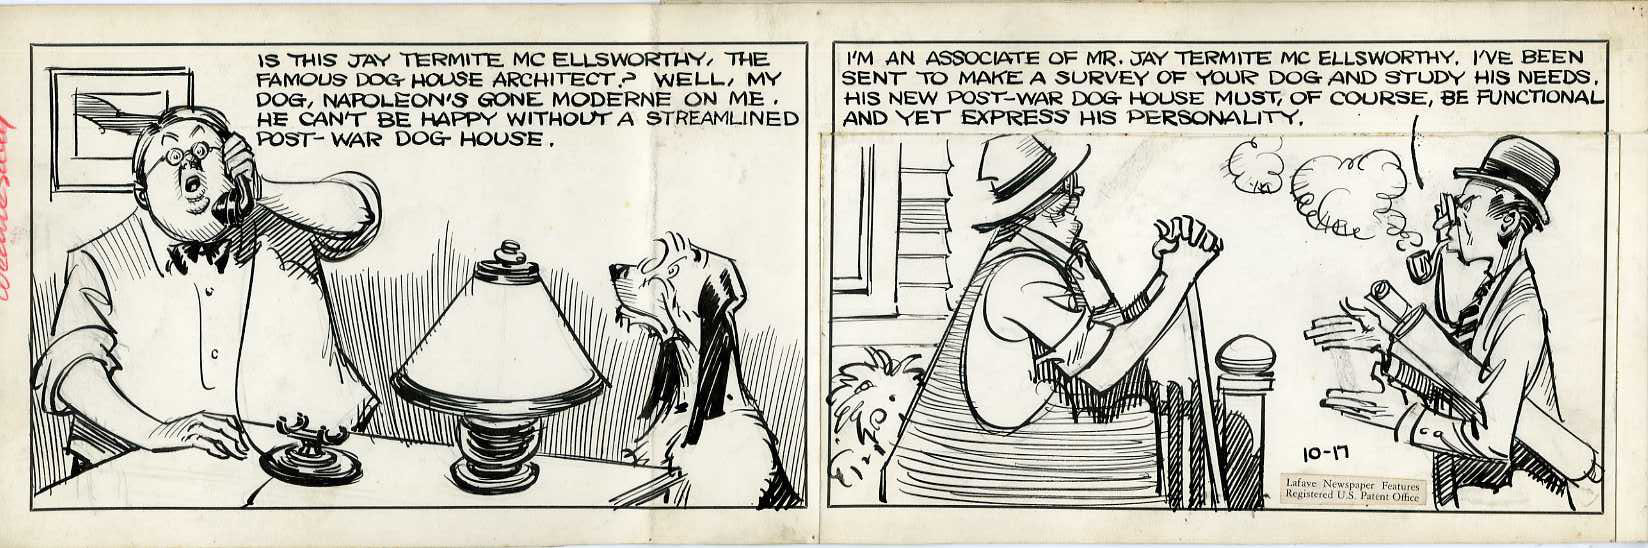 CLIFFORD McBRIDE - NAPOLEON DAILY STRIP ORIG ART 10-17 1940s / DOG ARCHITECT